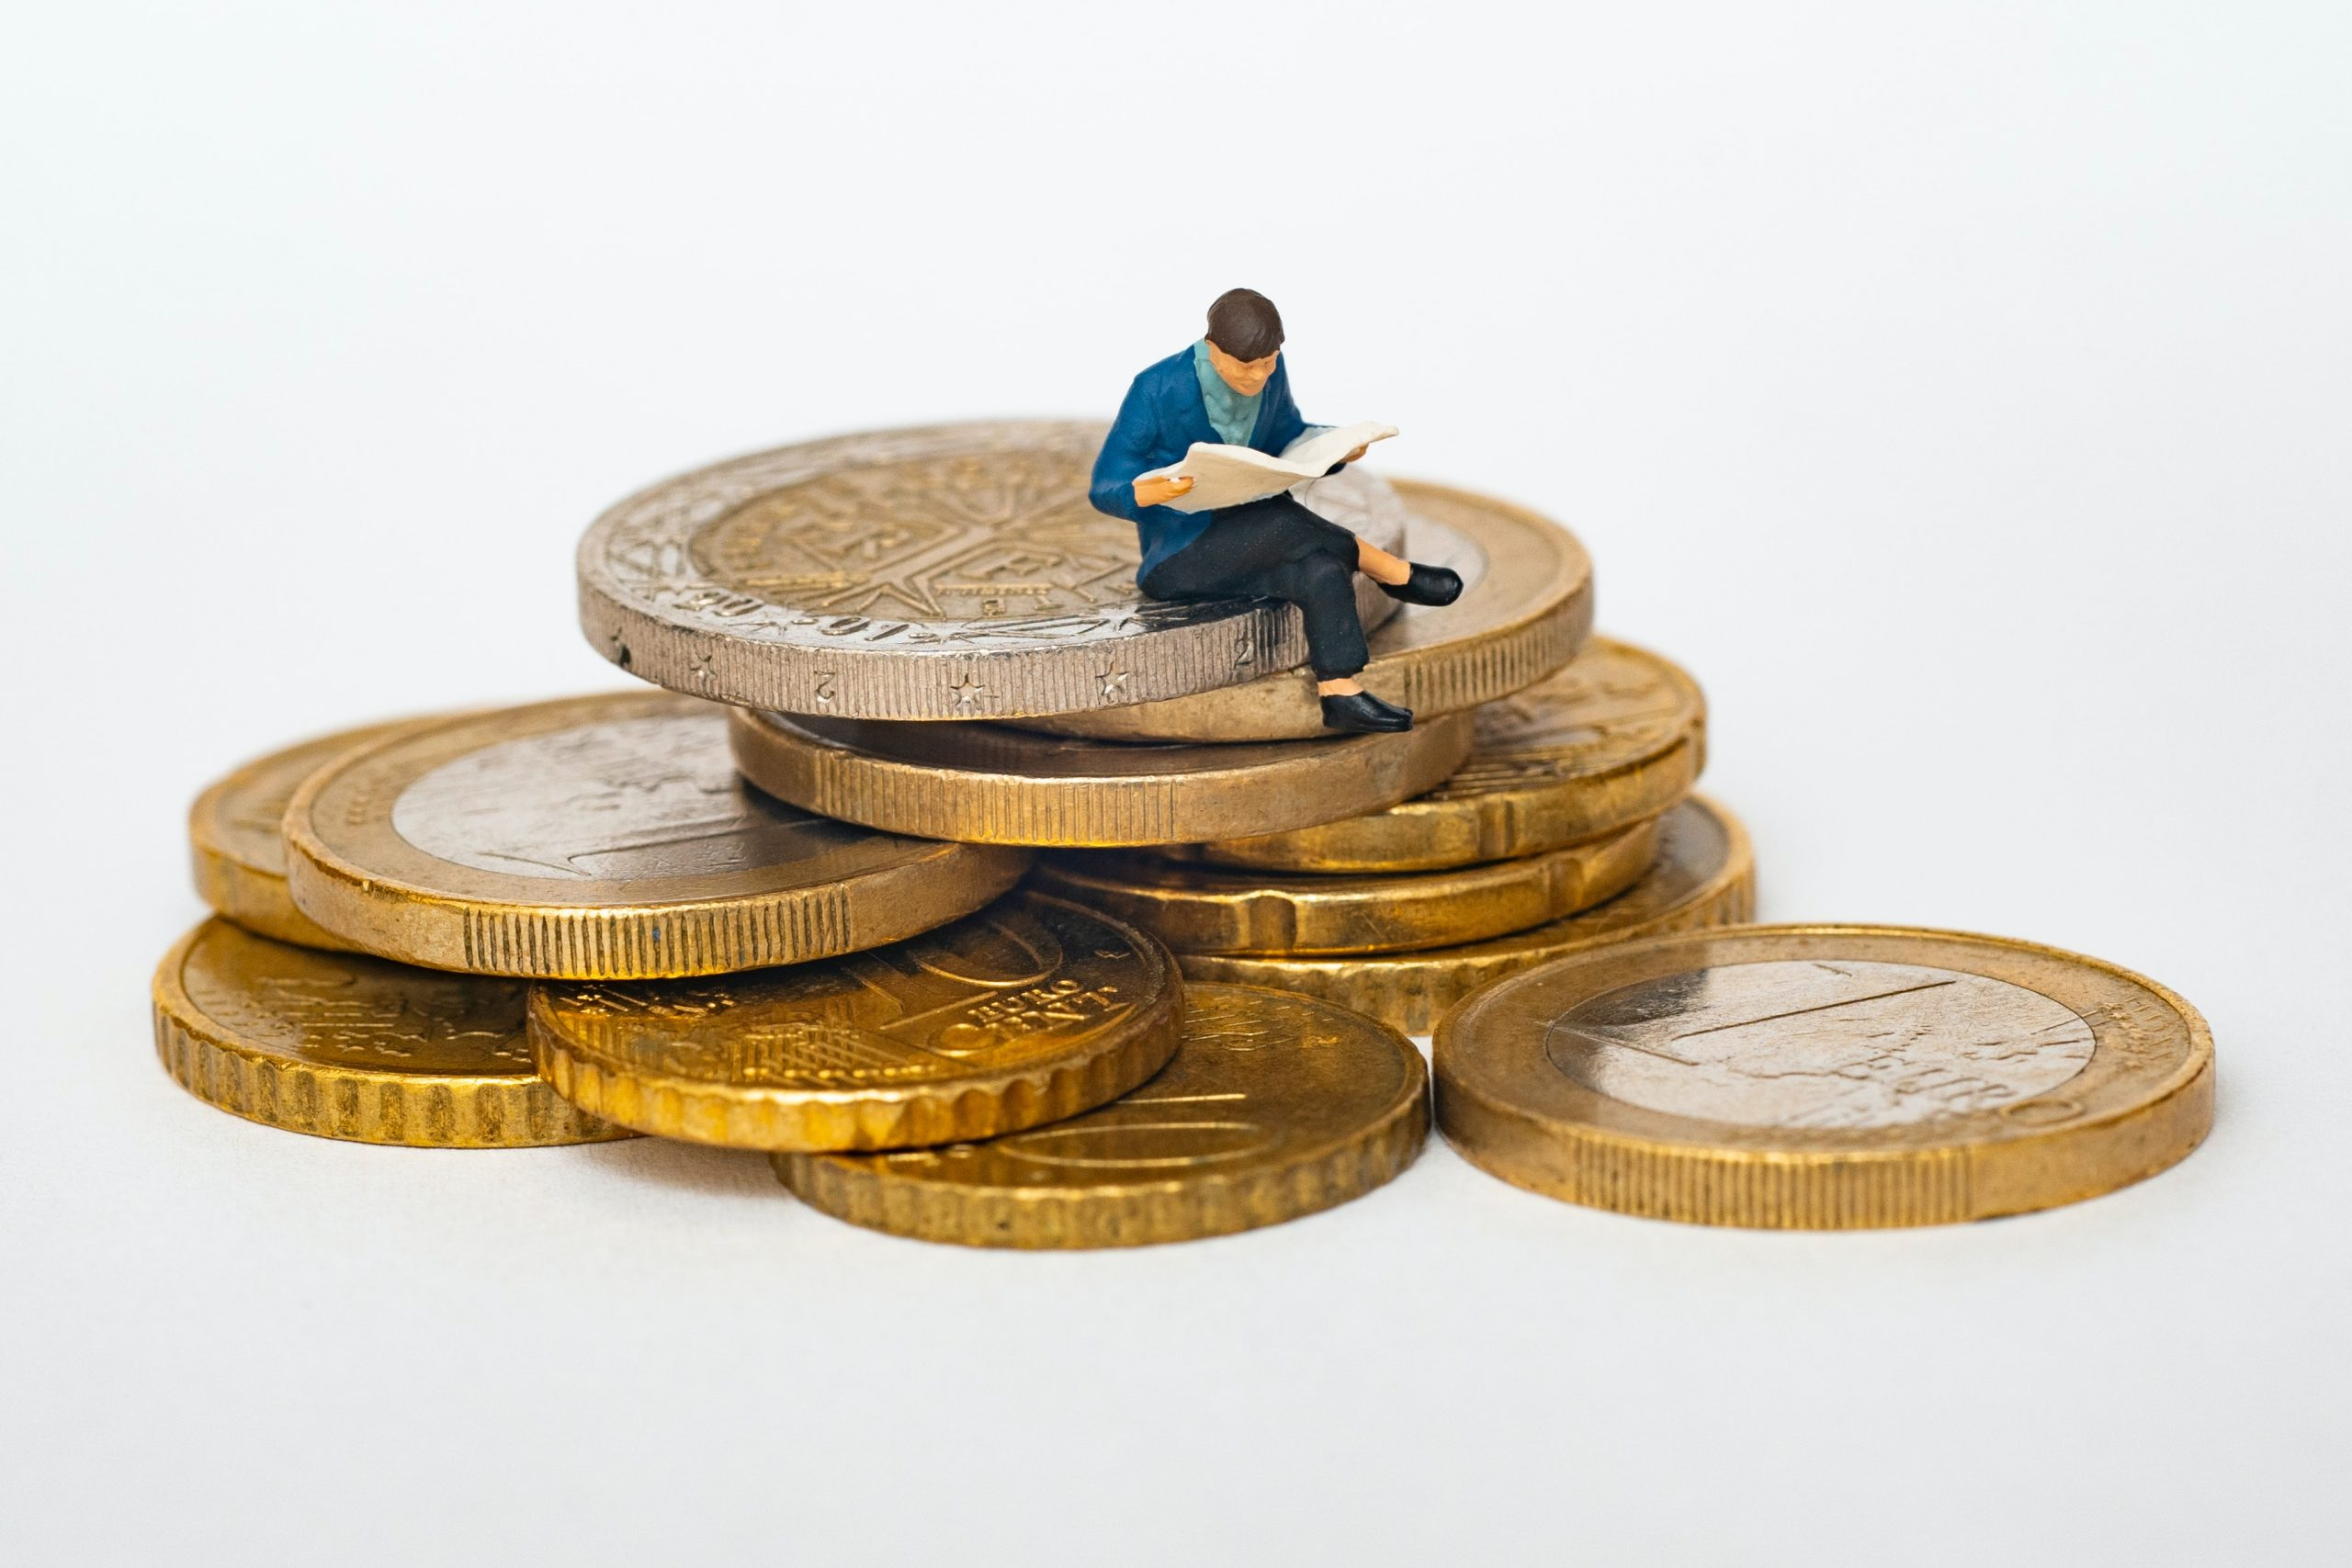 tips to write blogs to make money